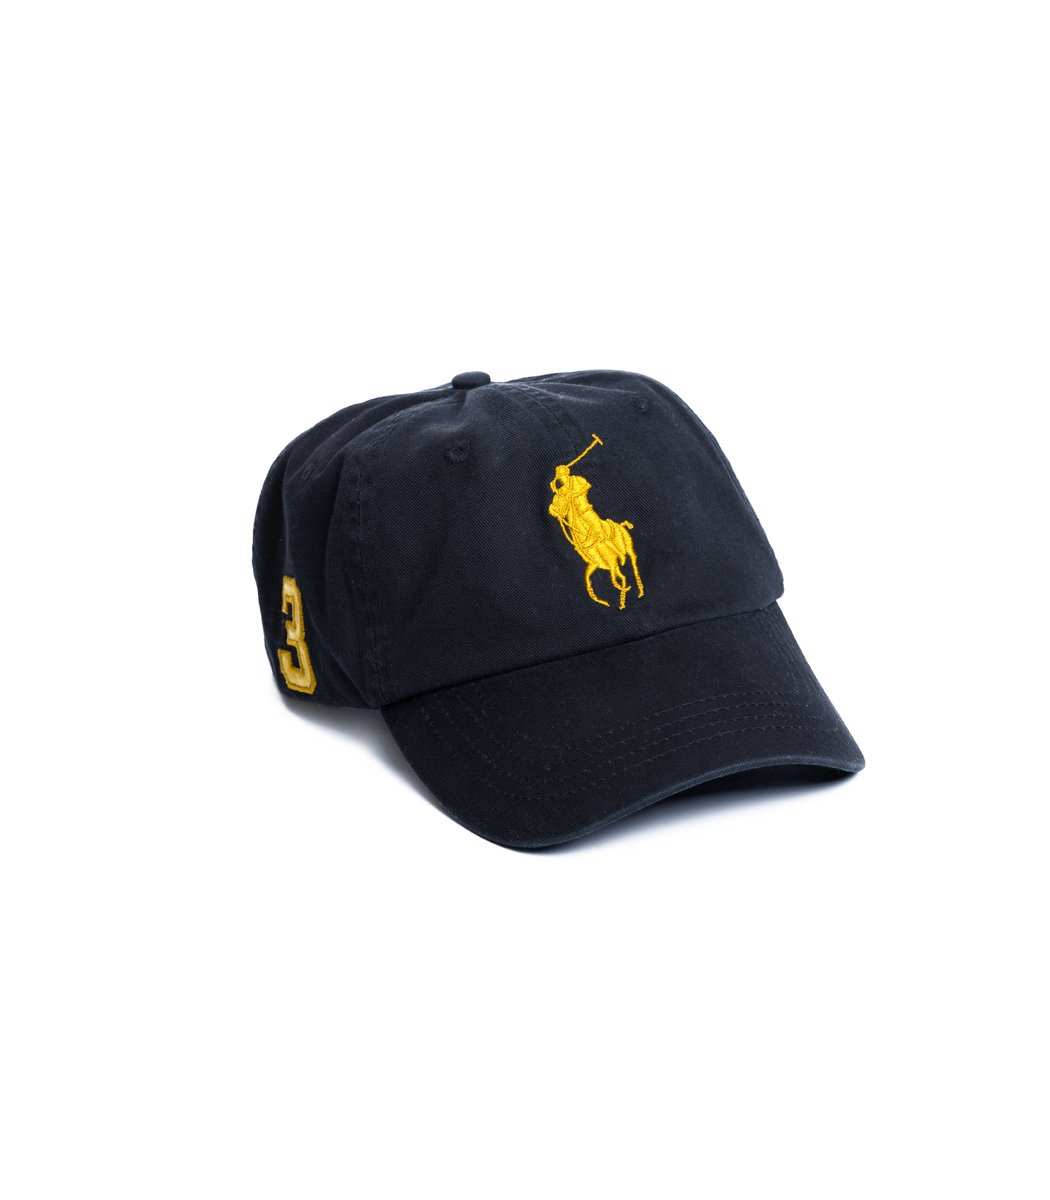 Кепка POLO Ralph Lauren Classic 3 Чёрный/жёлтый